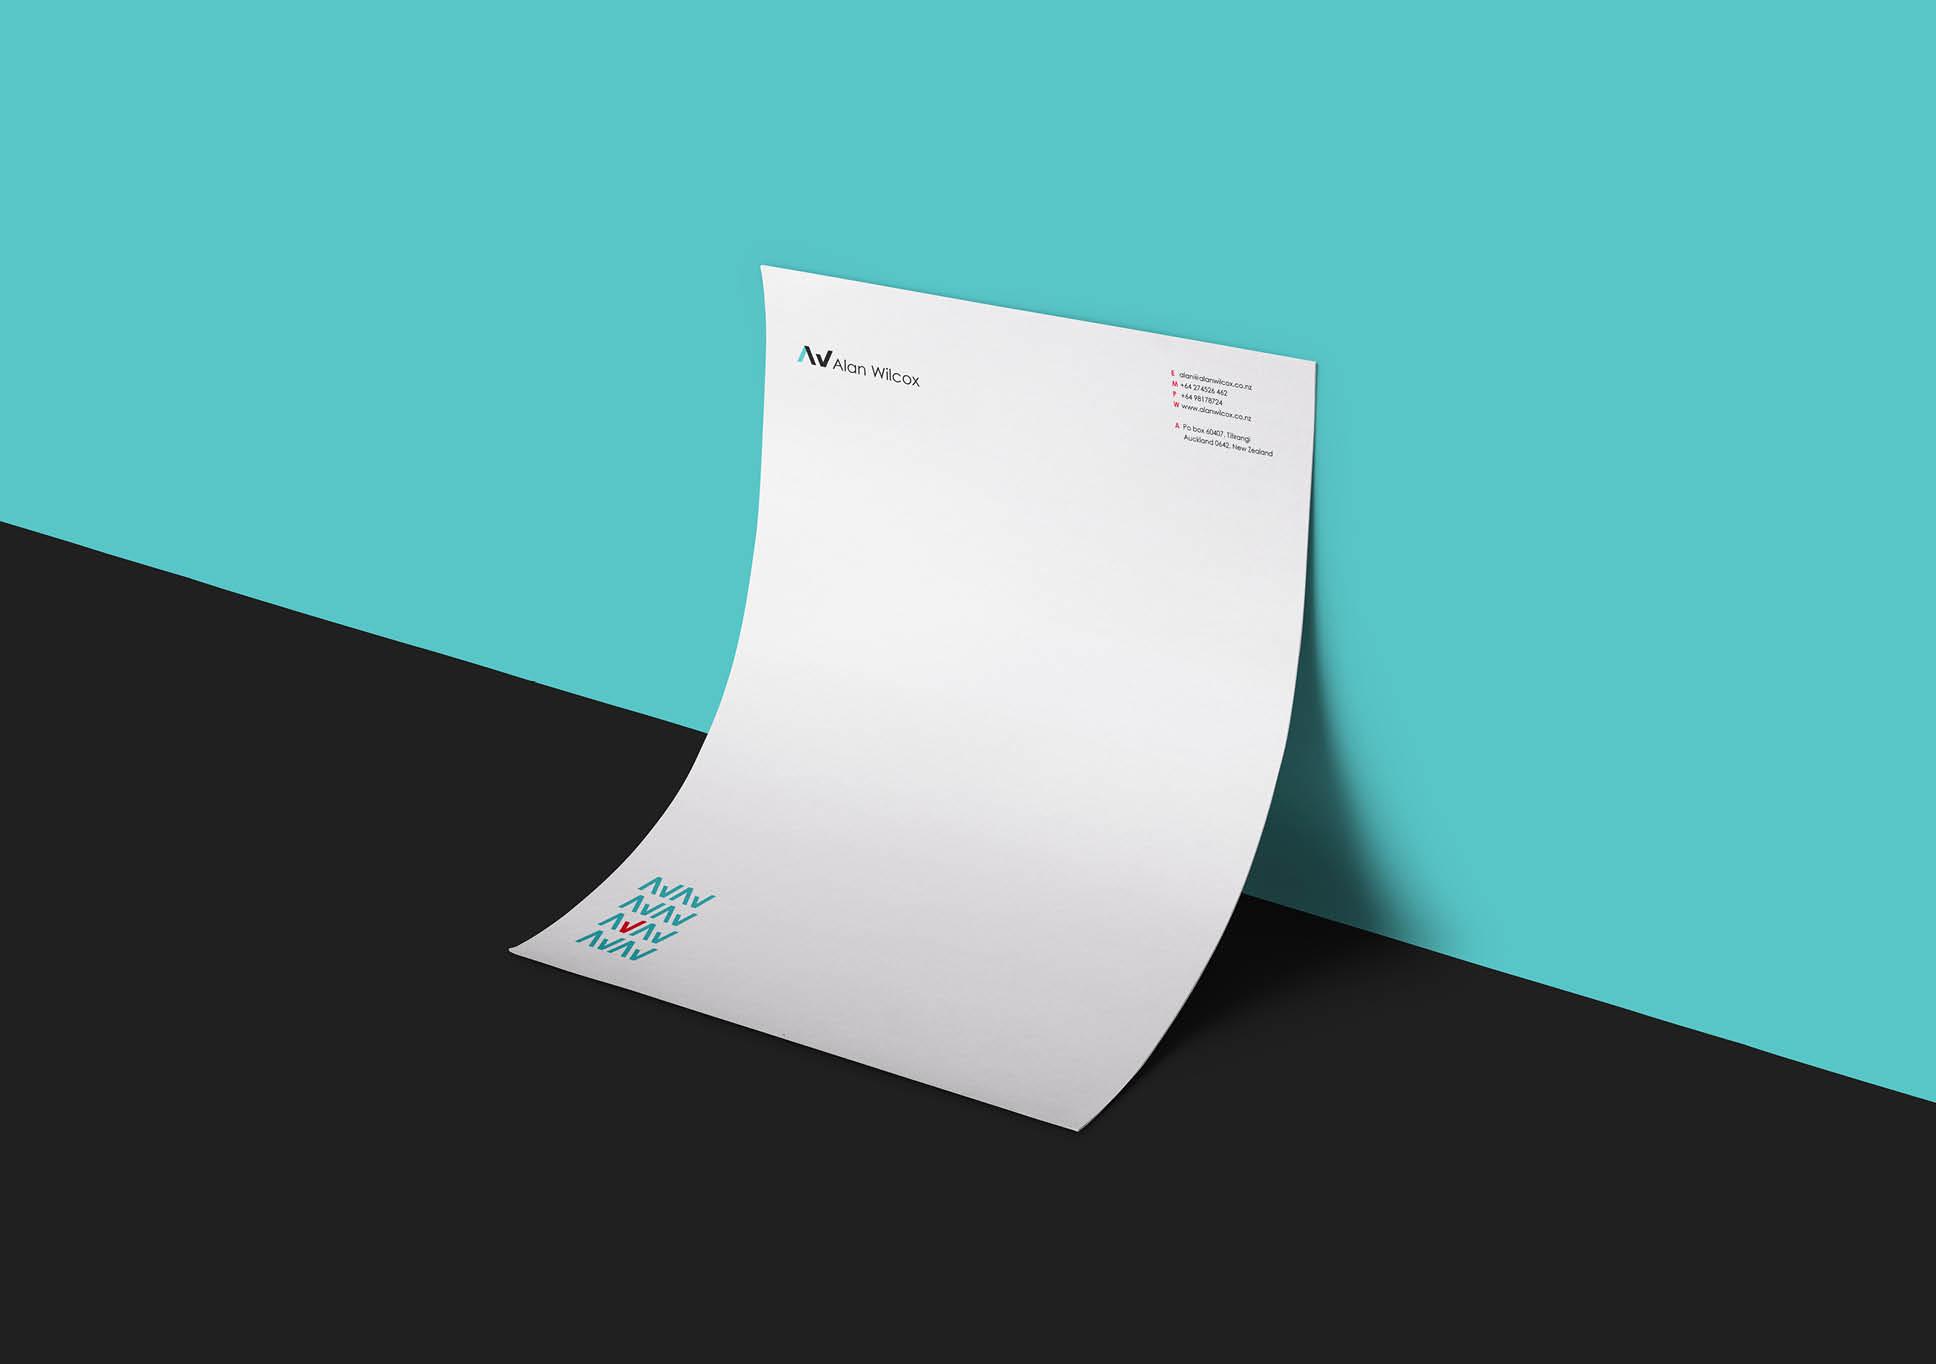 Alan Wilcox letterhead